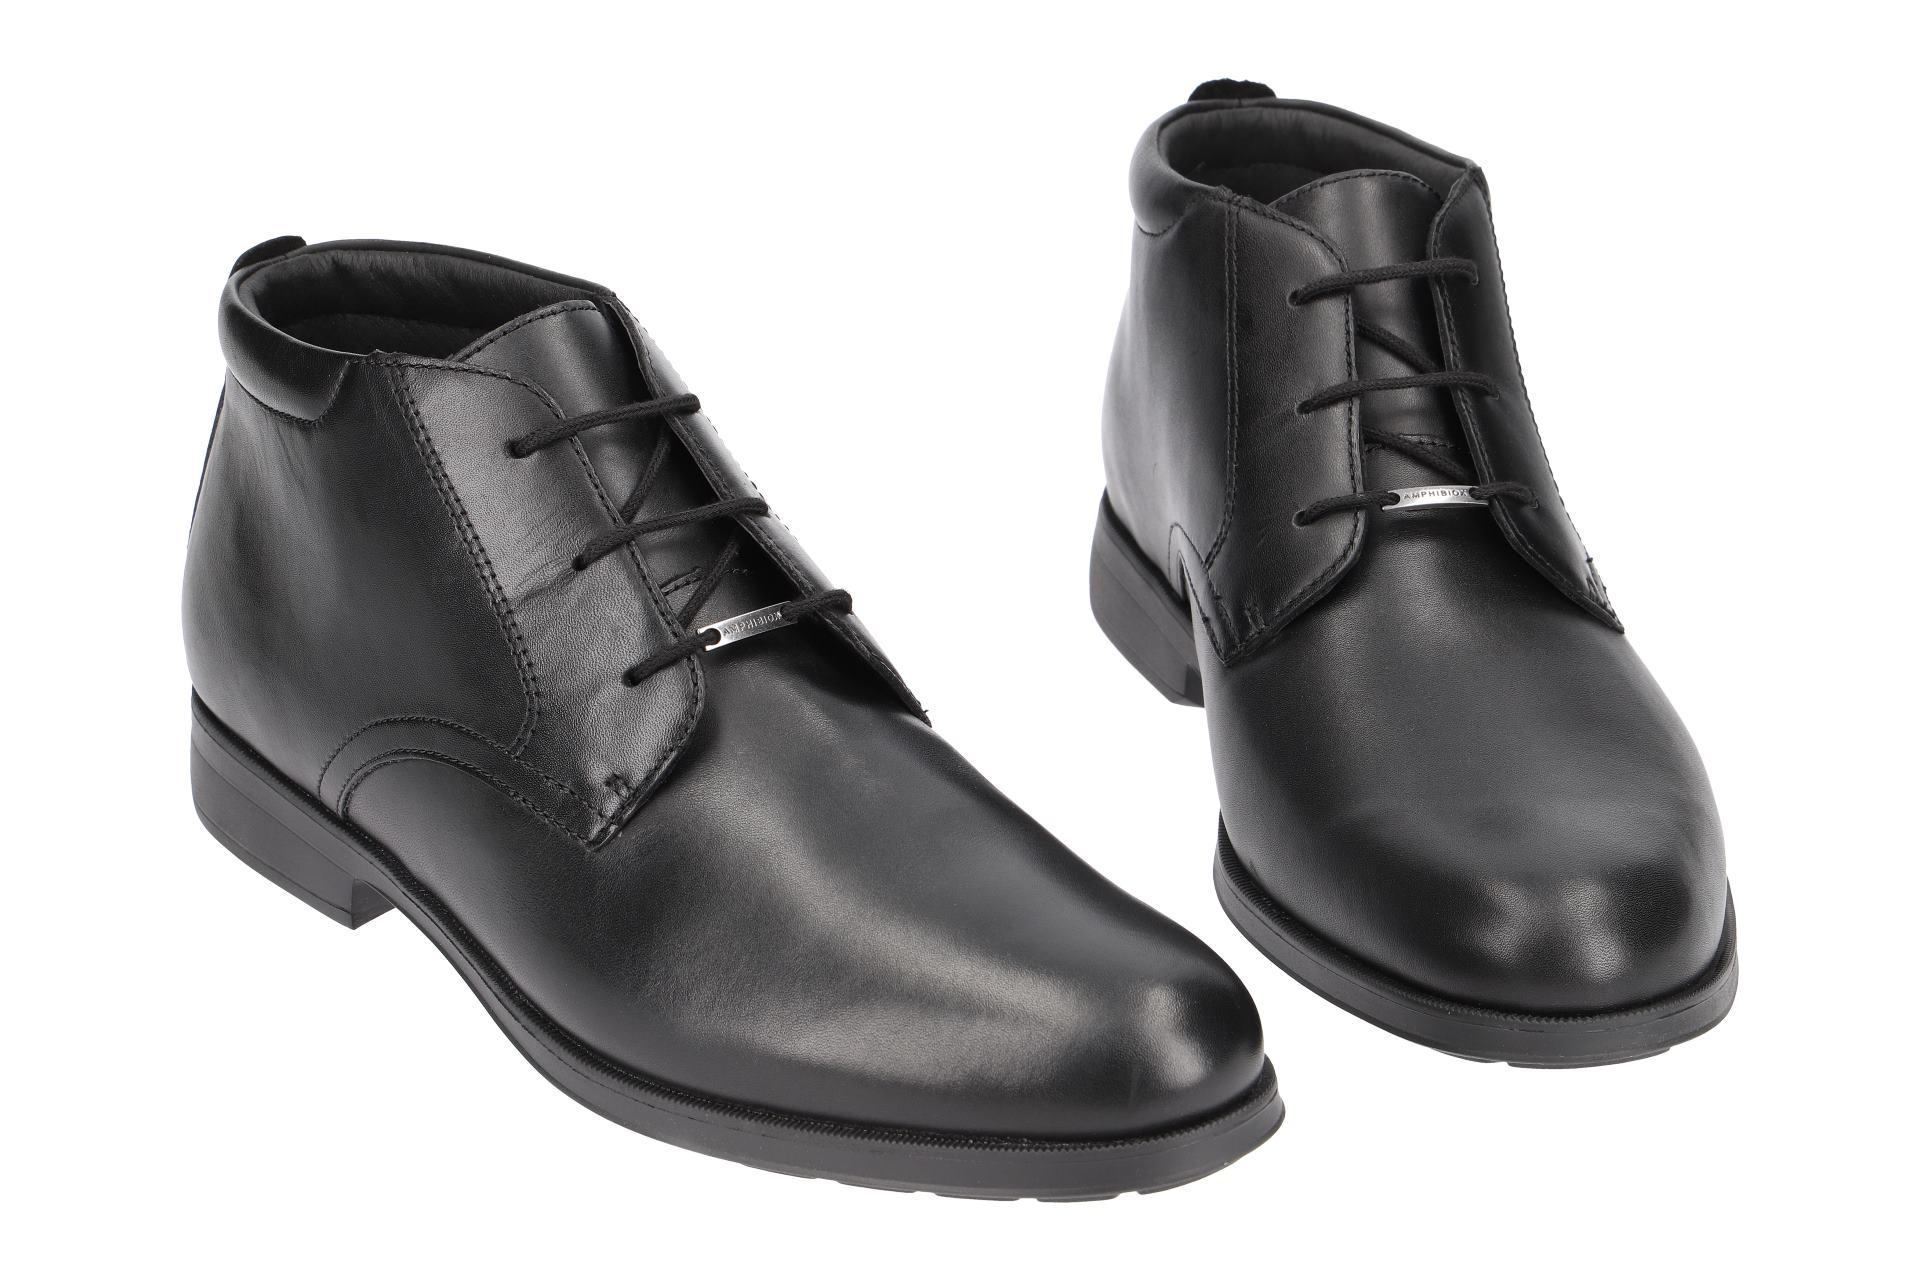 Geox Schuhe HILSTONE ABX schwarz Herrenstiefelette U845TB